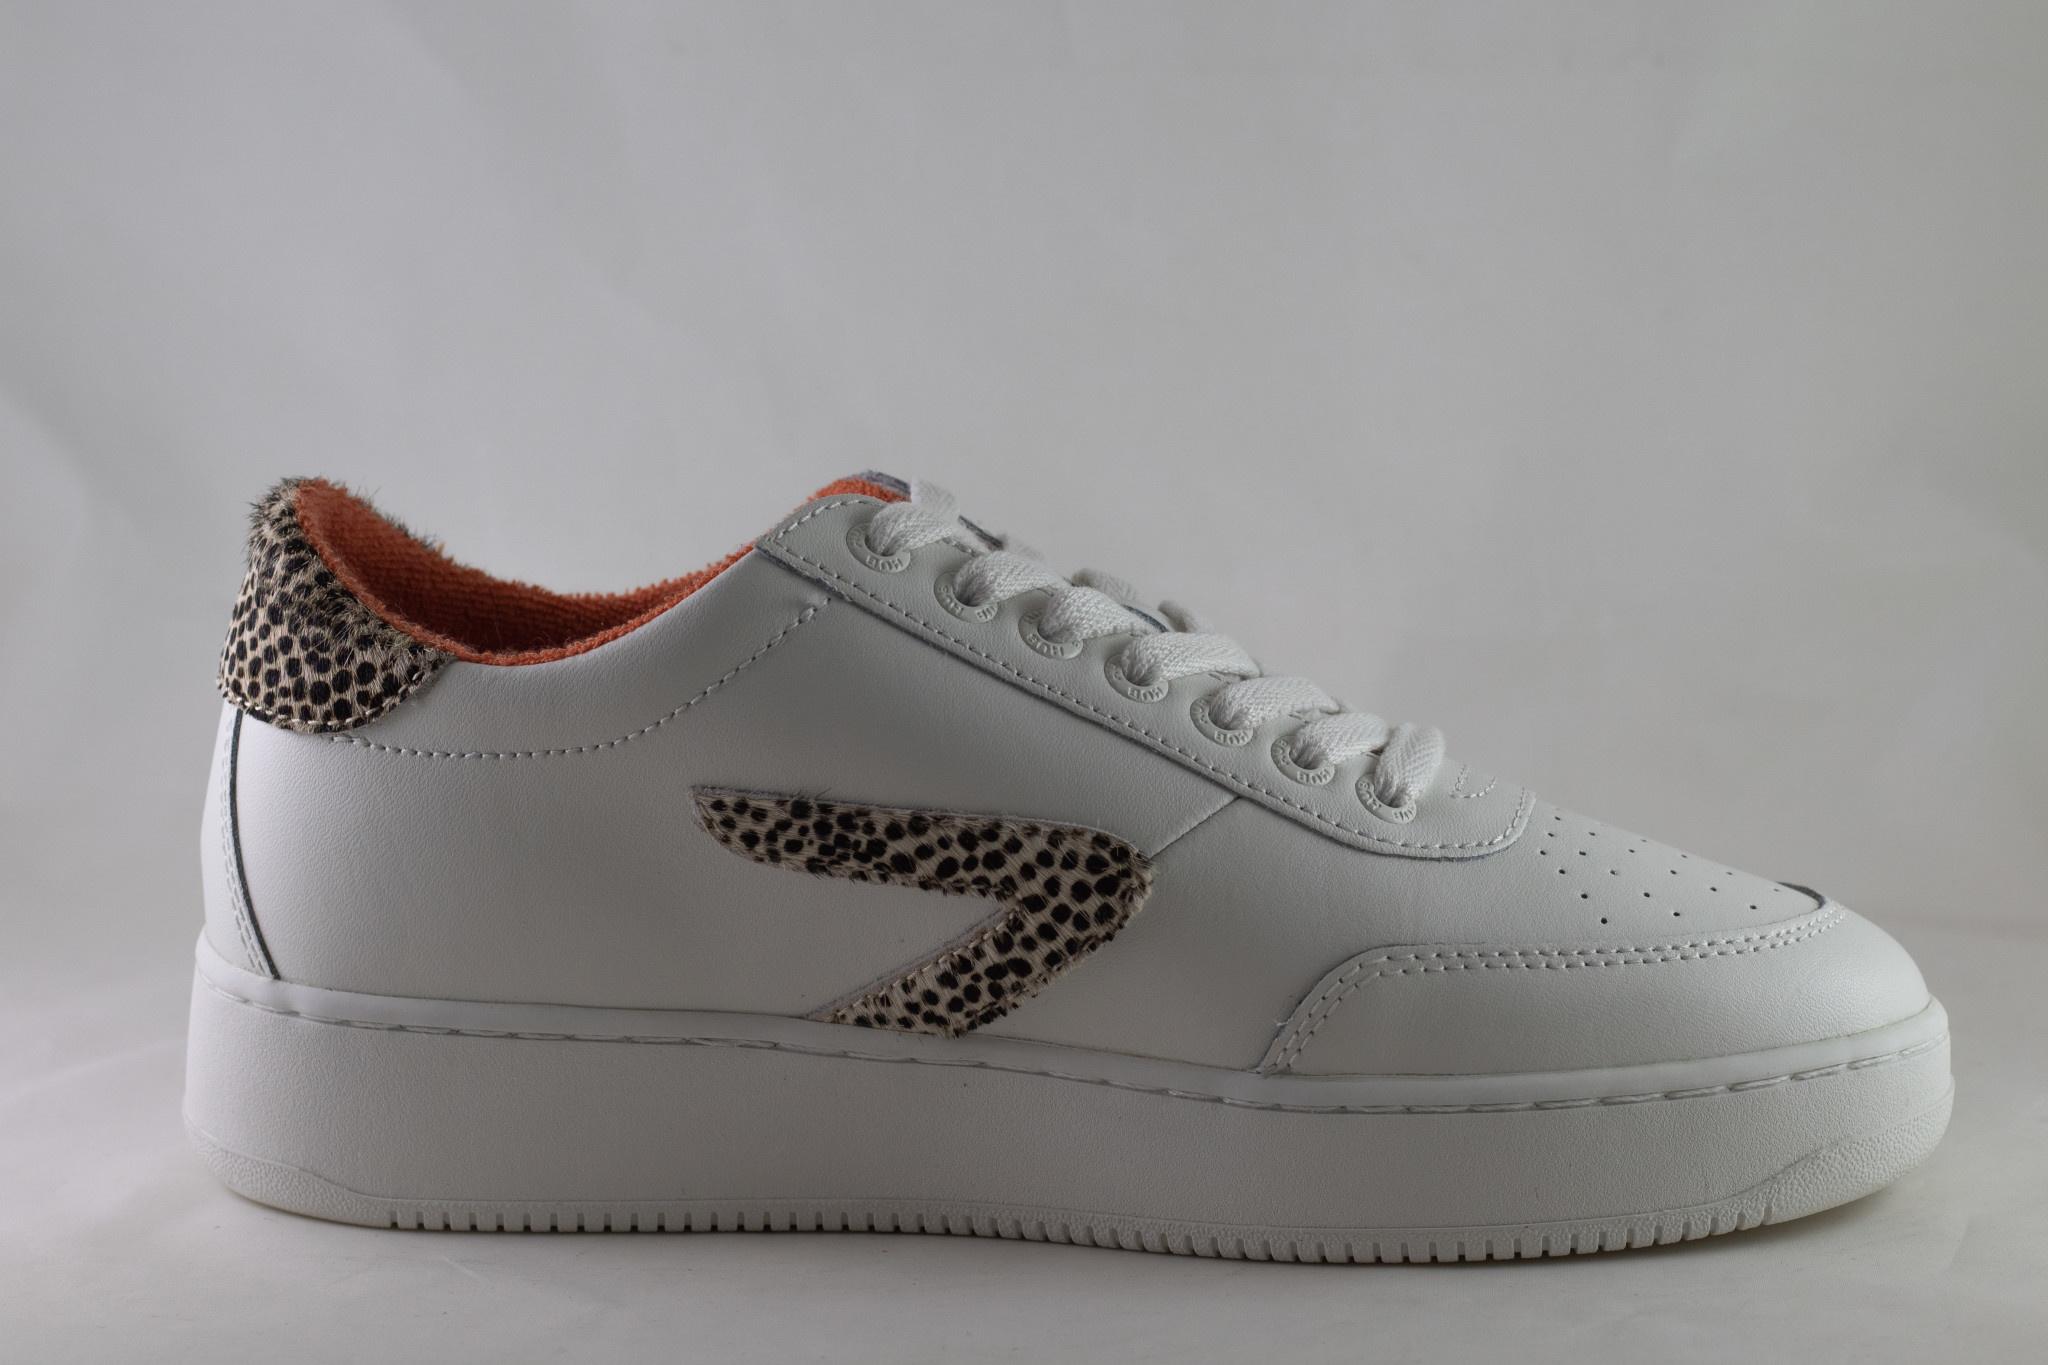 HUB Baseline-Z  L31 No Perf  Off White/ Cheetah